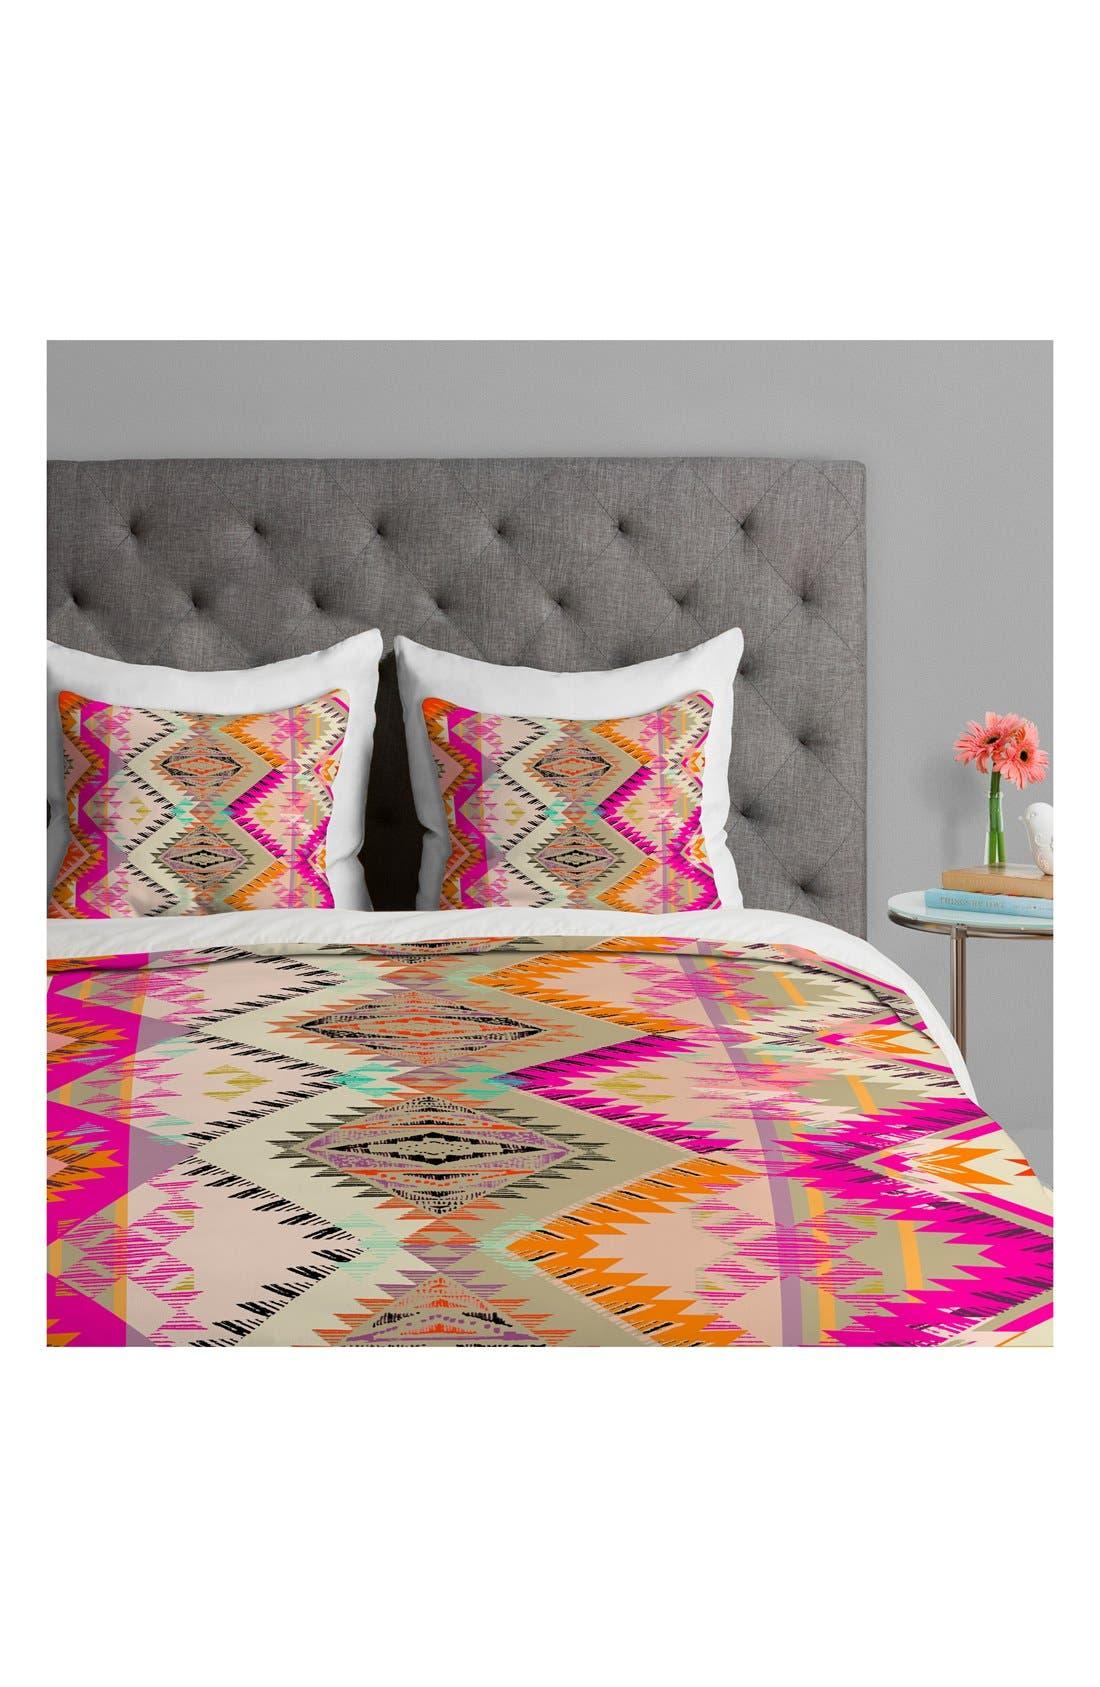 Pattern State Marker Sun Duvet Cover & Sham Set,                             Alternate thumbnail 2, color,                             Pink